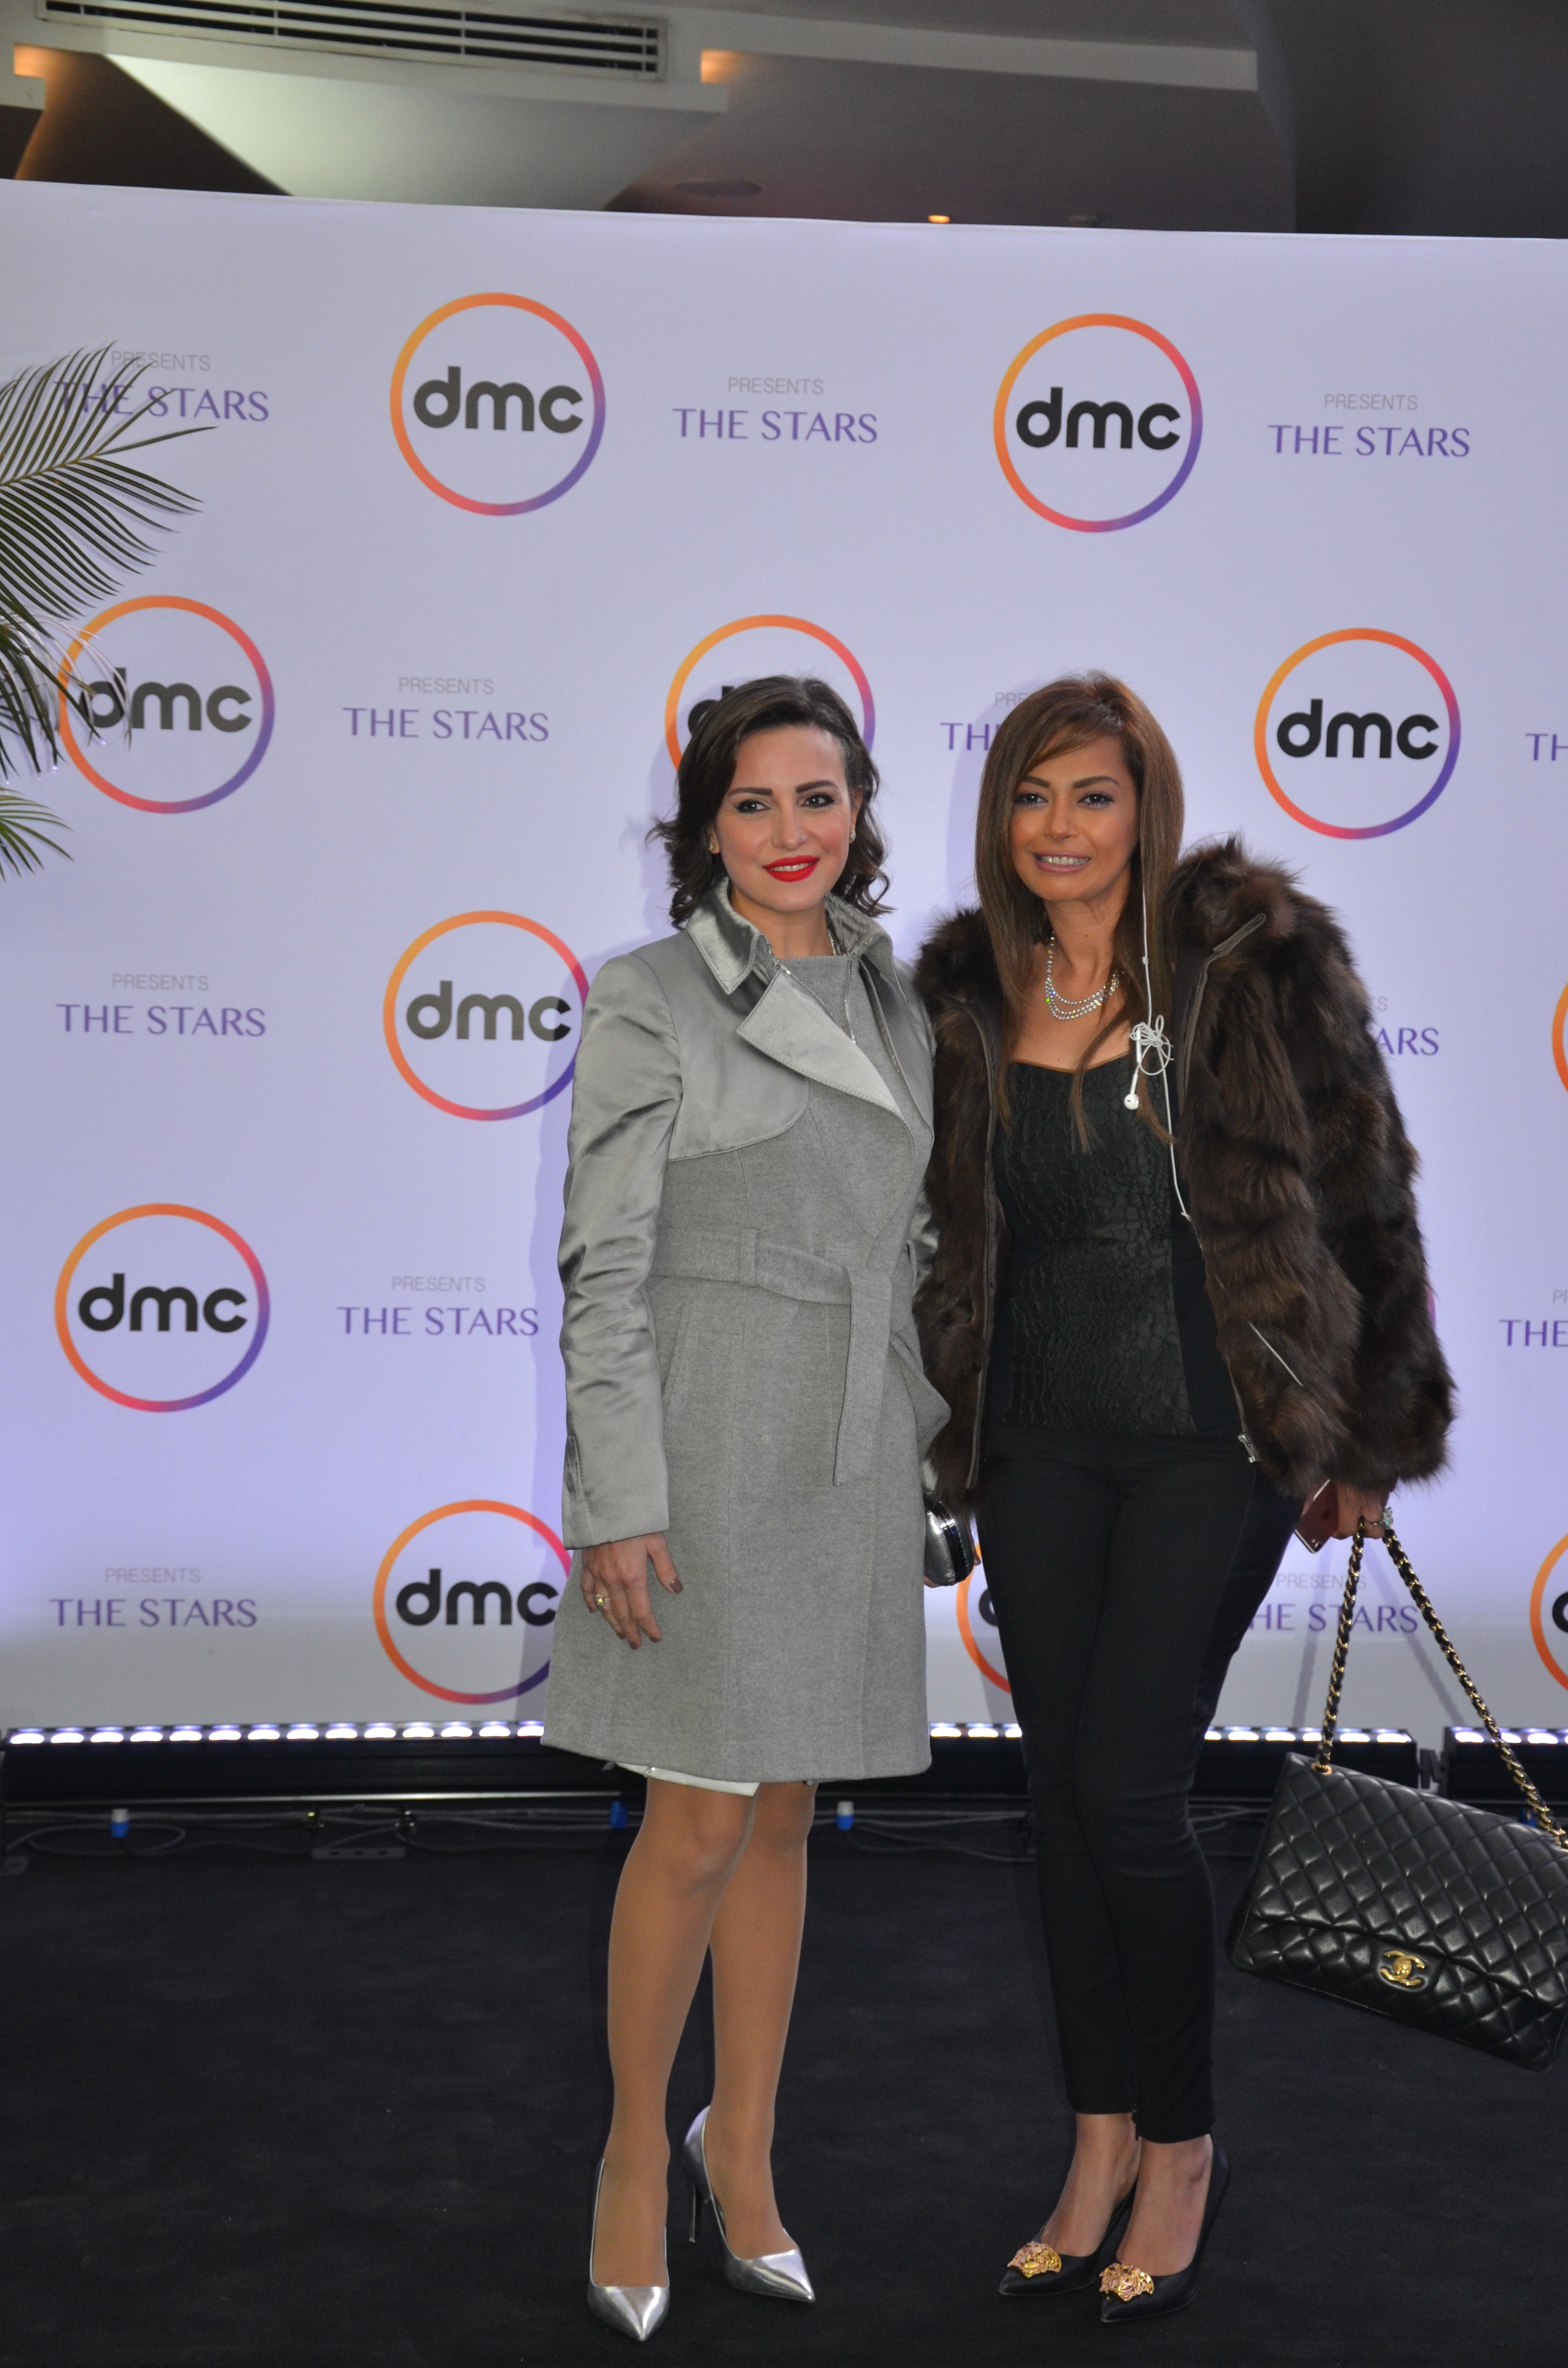 Reham Abdel Ghafour and Dalia Mostafa